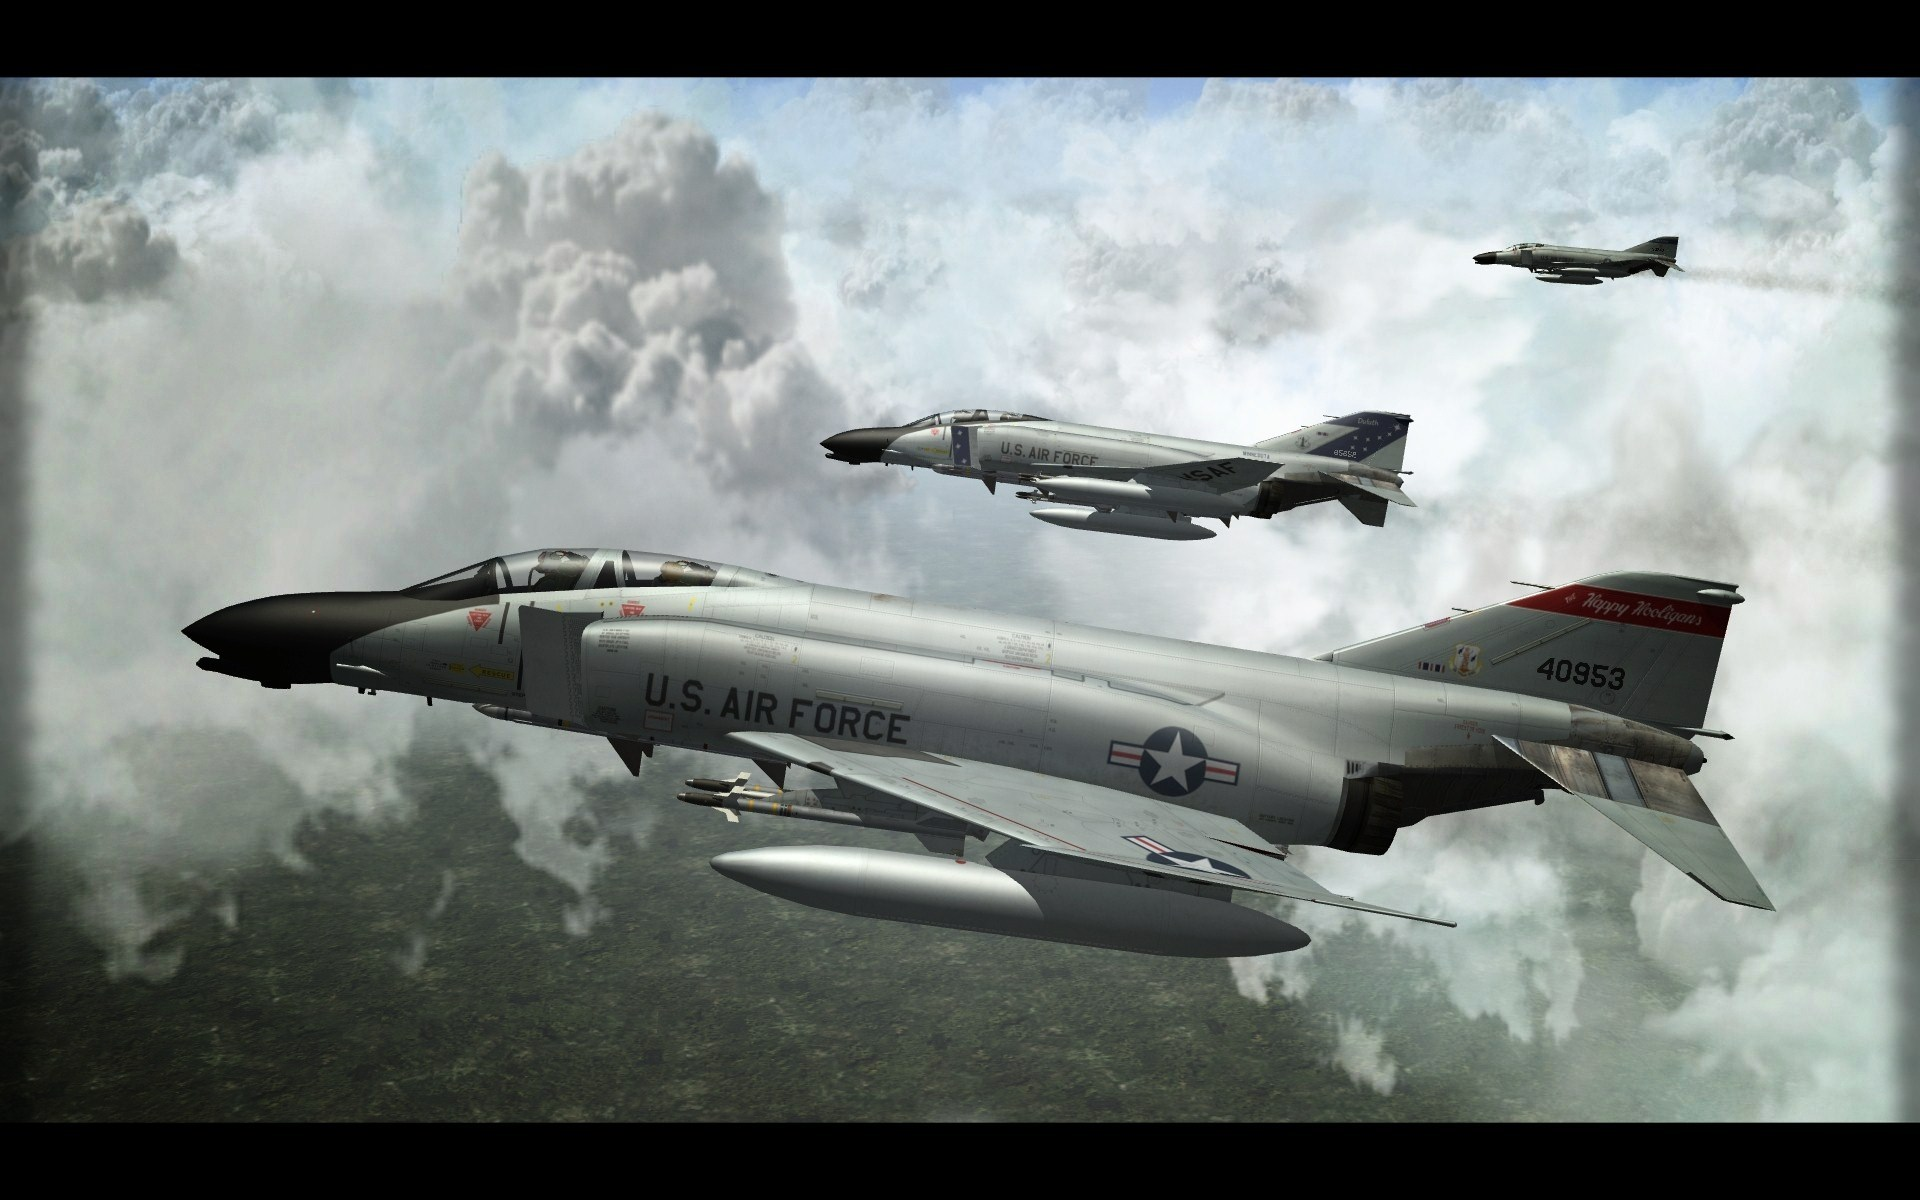 F-4D Phantom II in ANG Service.